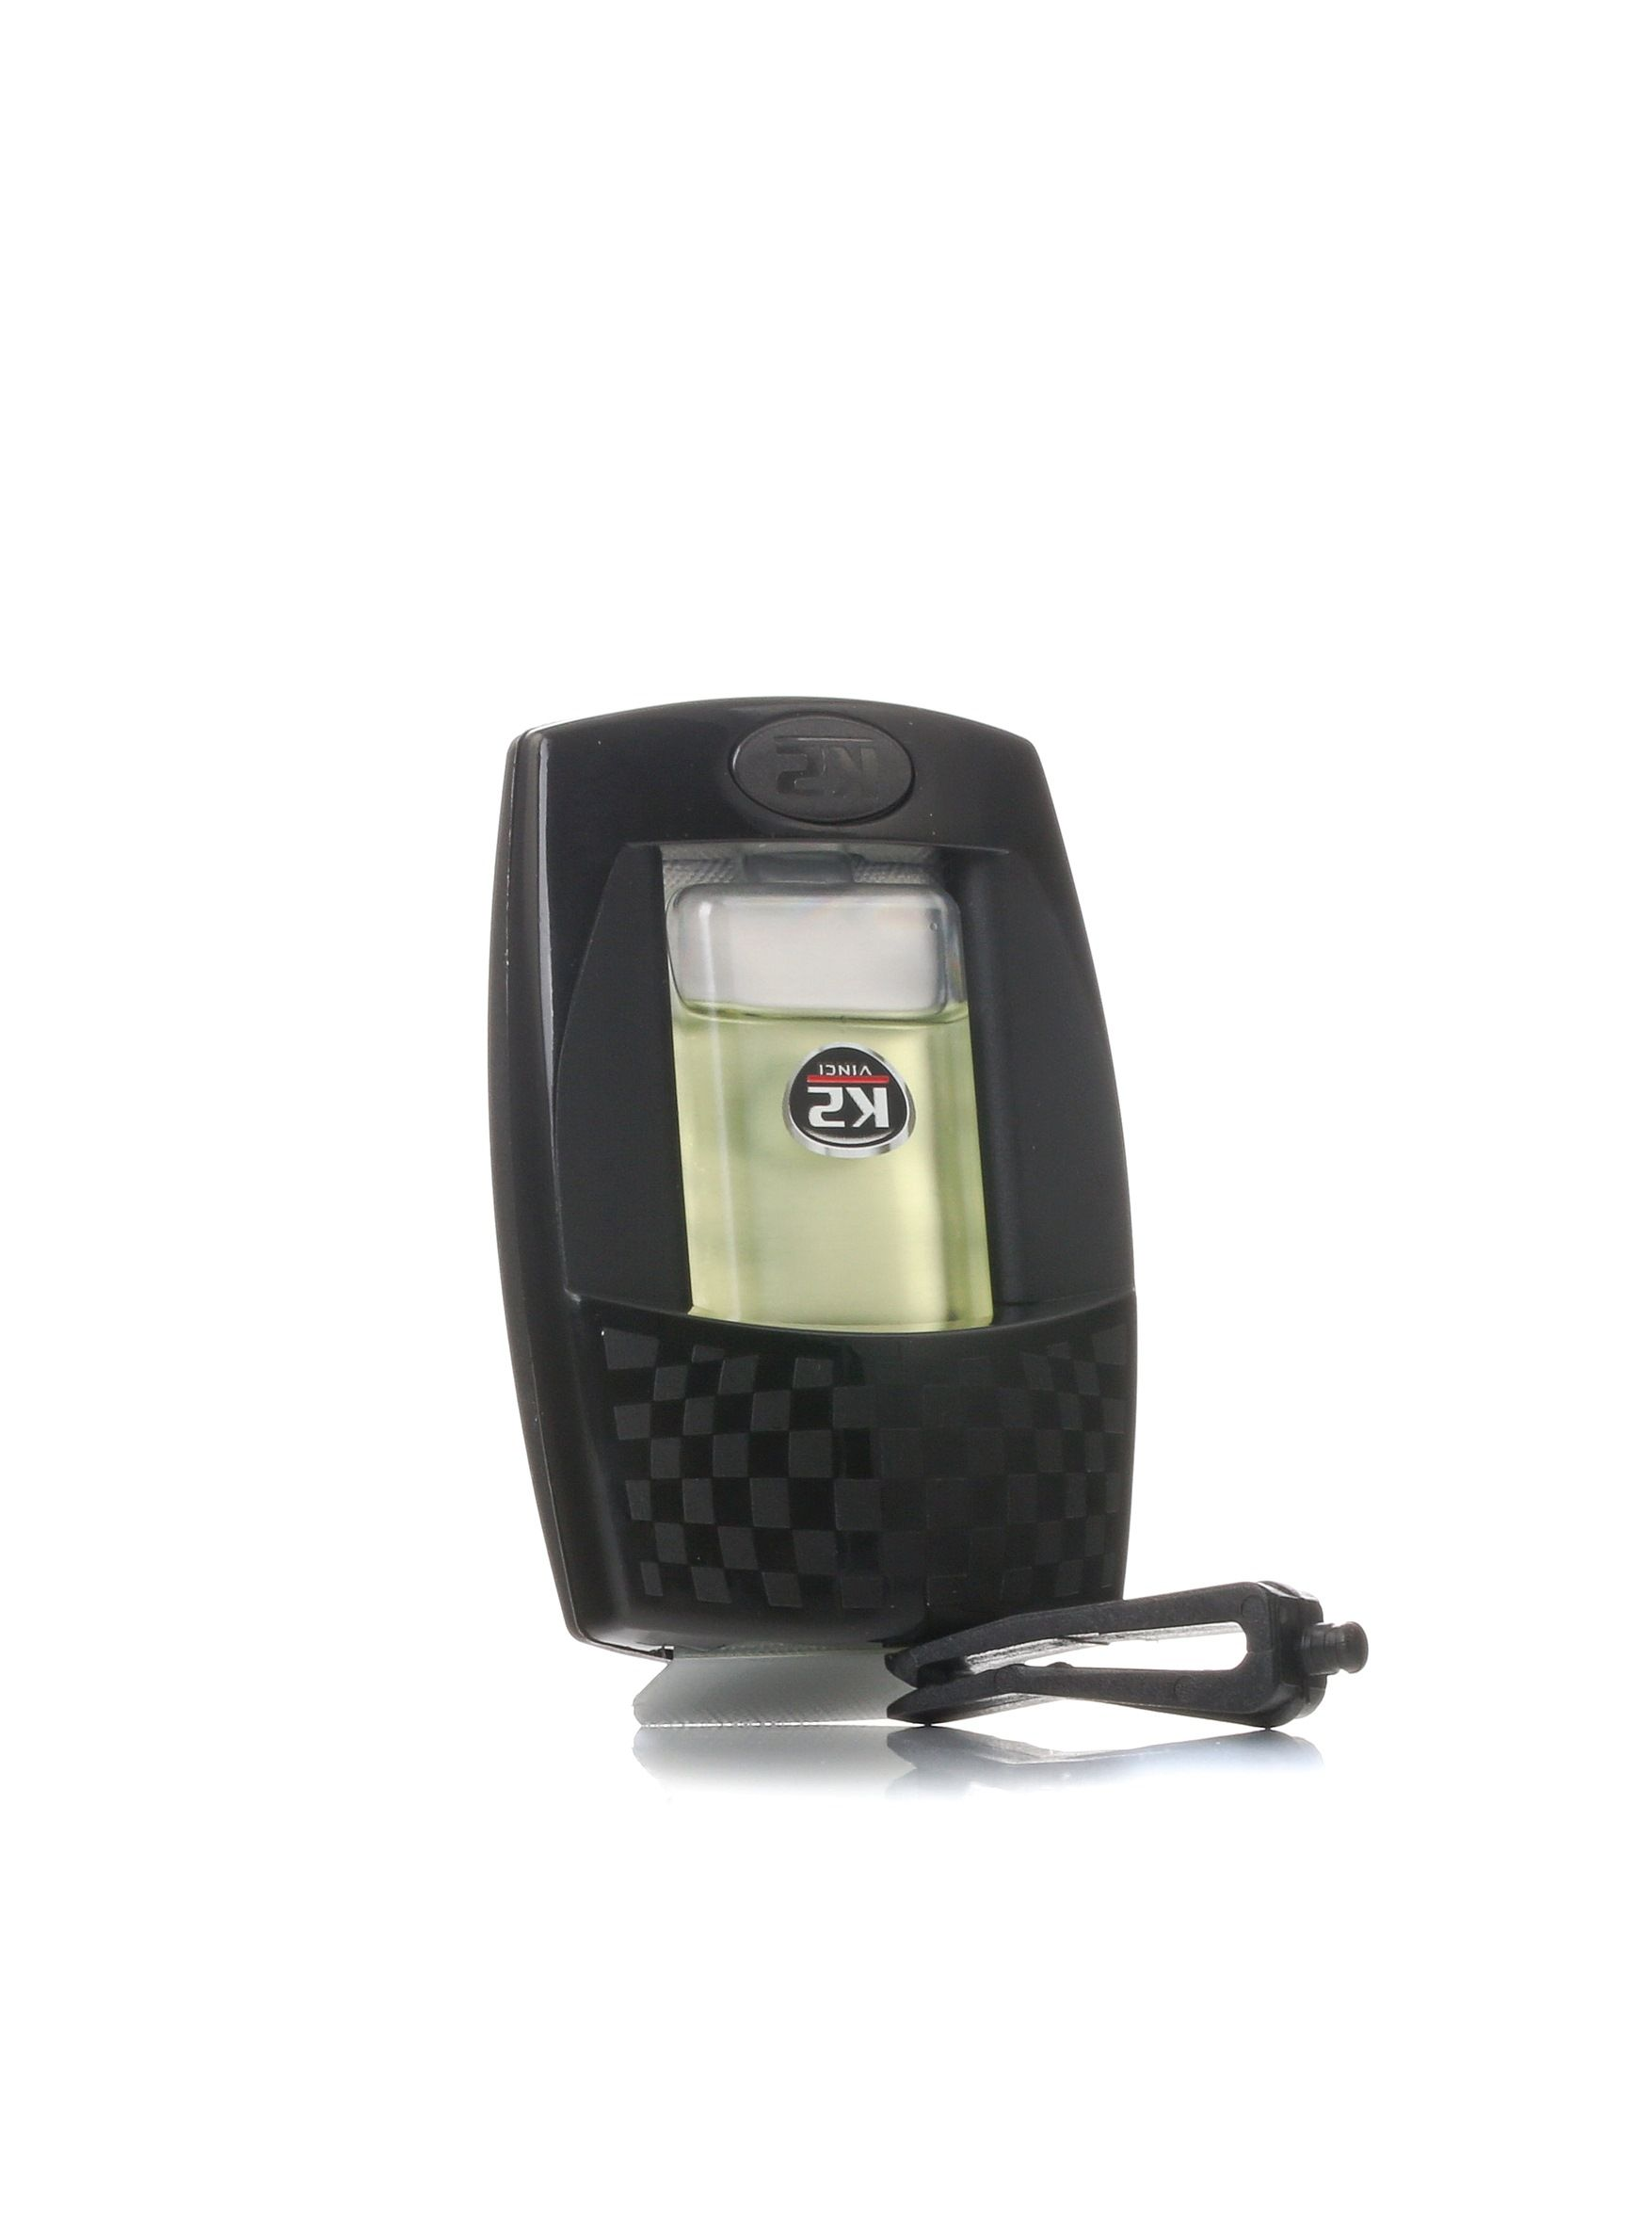 Ароматизатор K2 V122 оценка